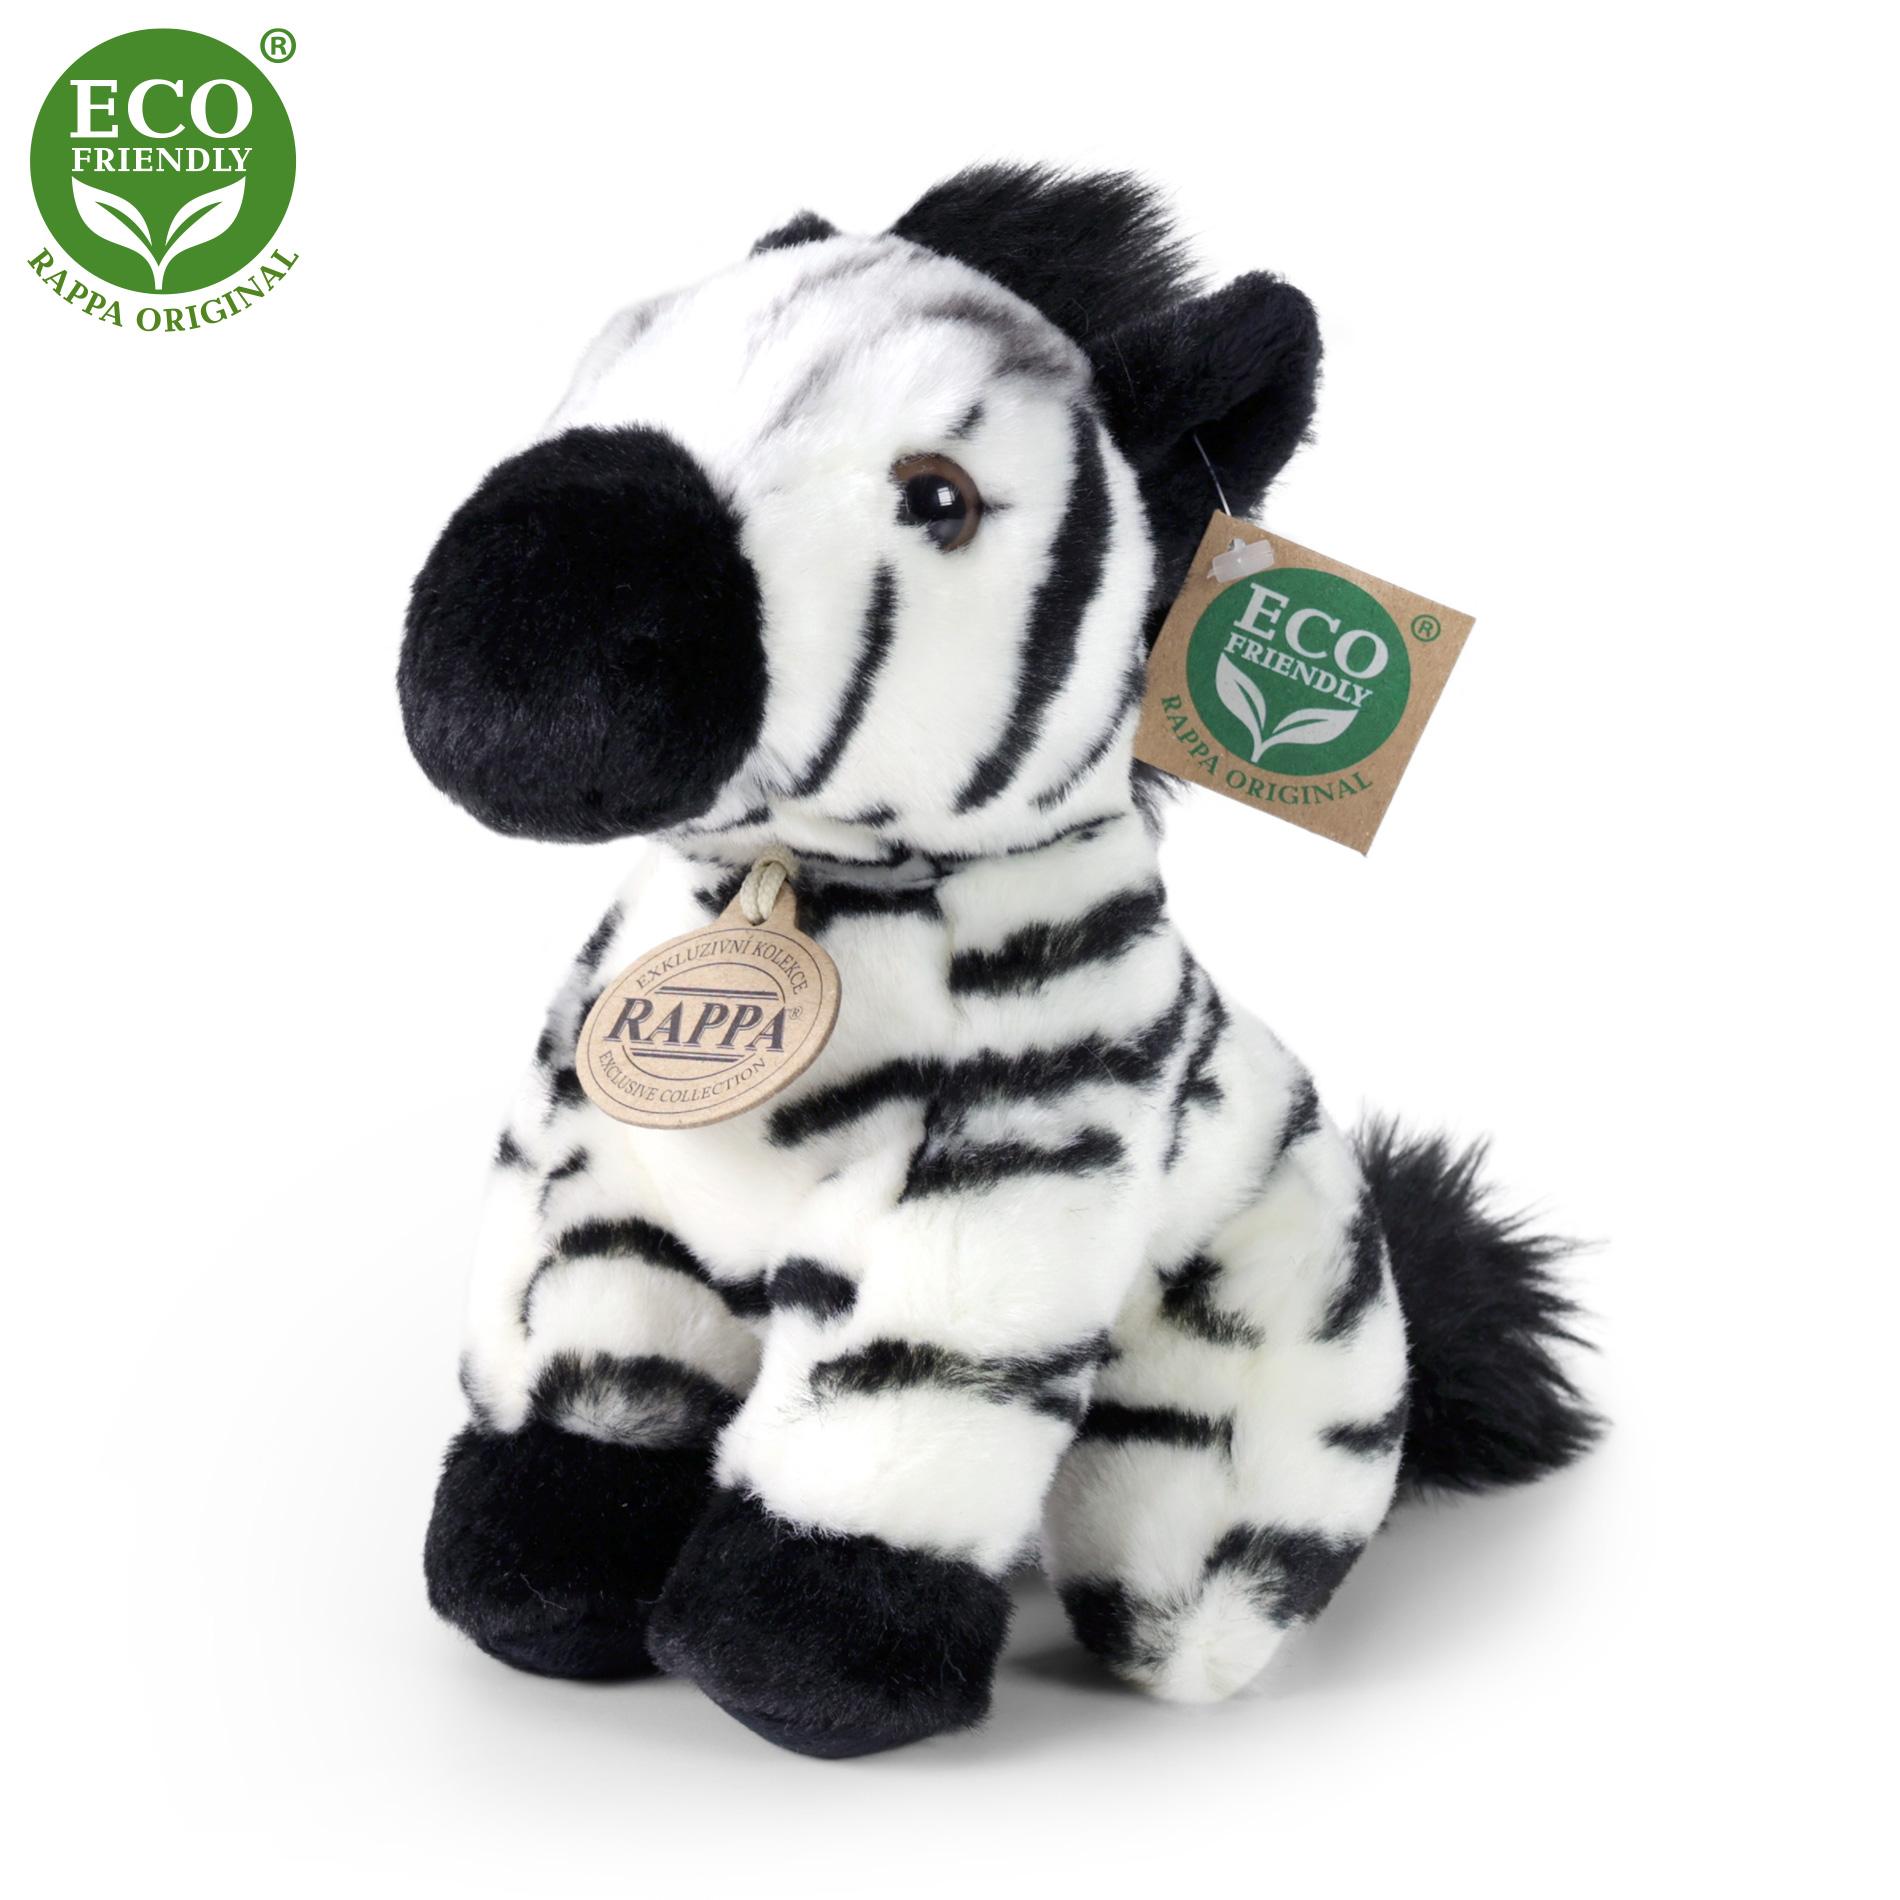 plyšová zebra sediaci, 18 cm